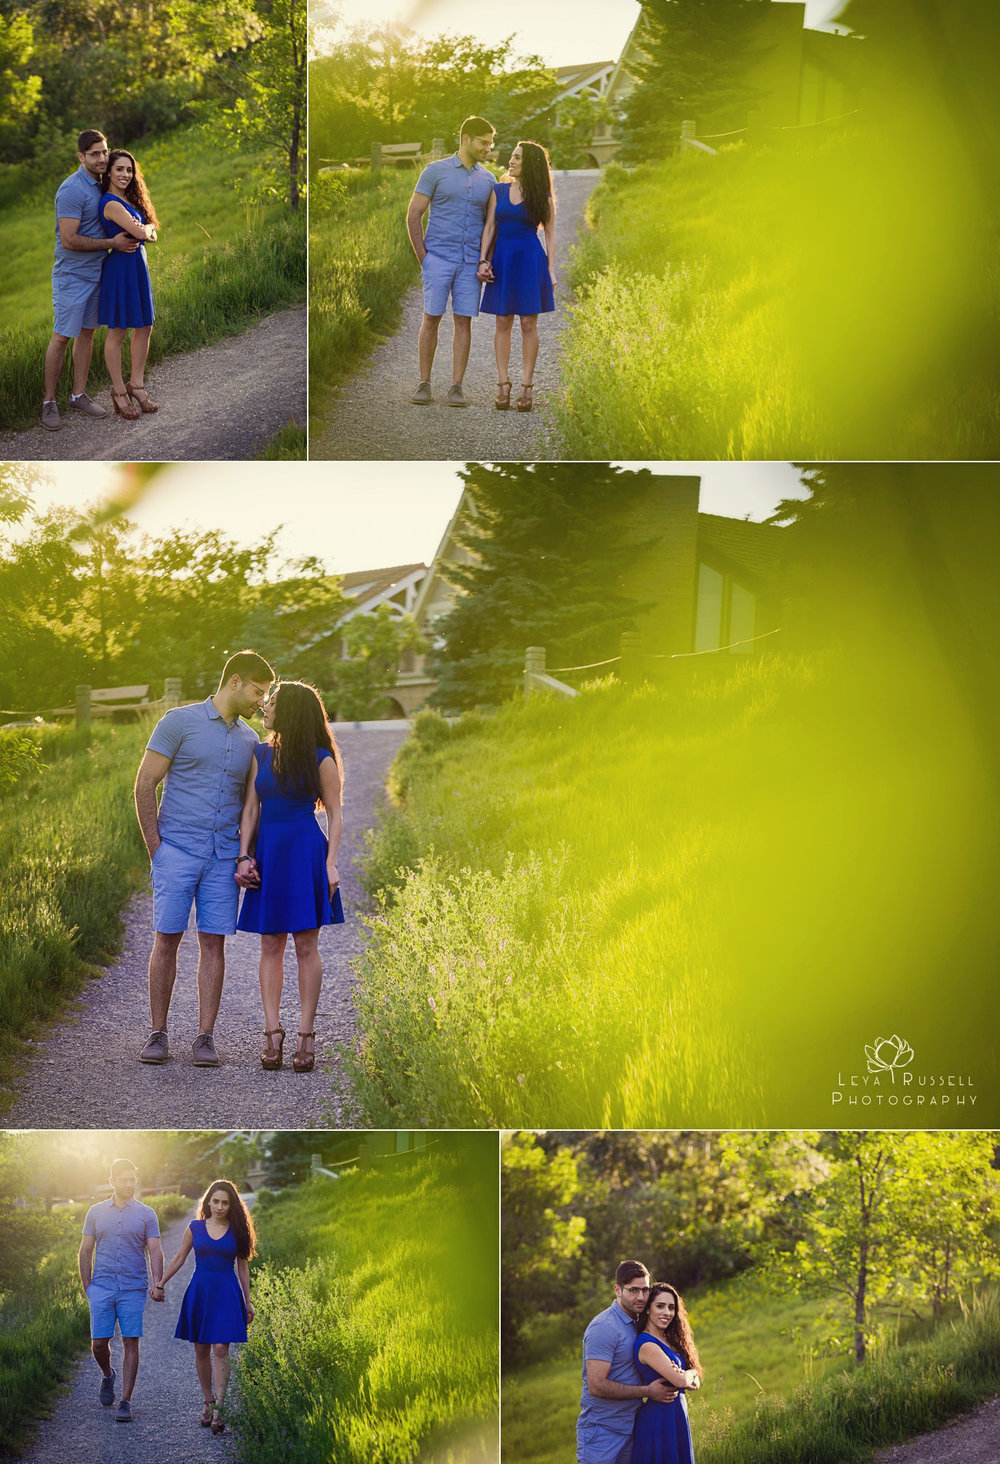 013-Donya & Kal S:P.jpg